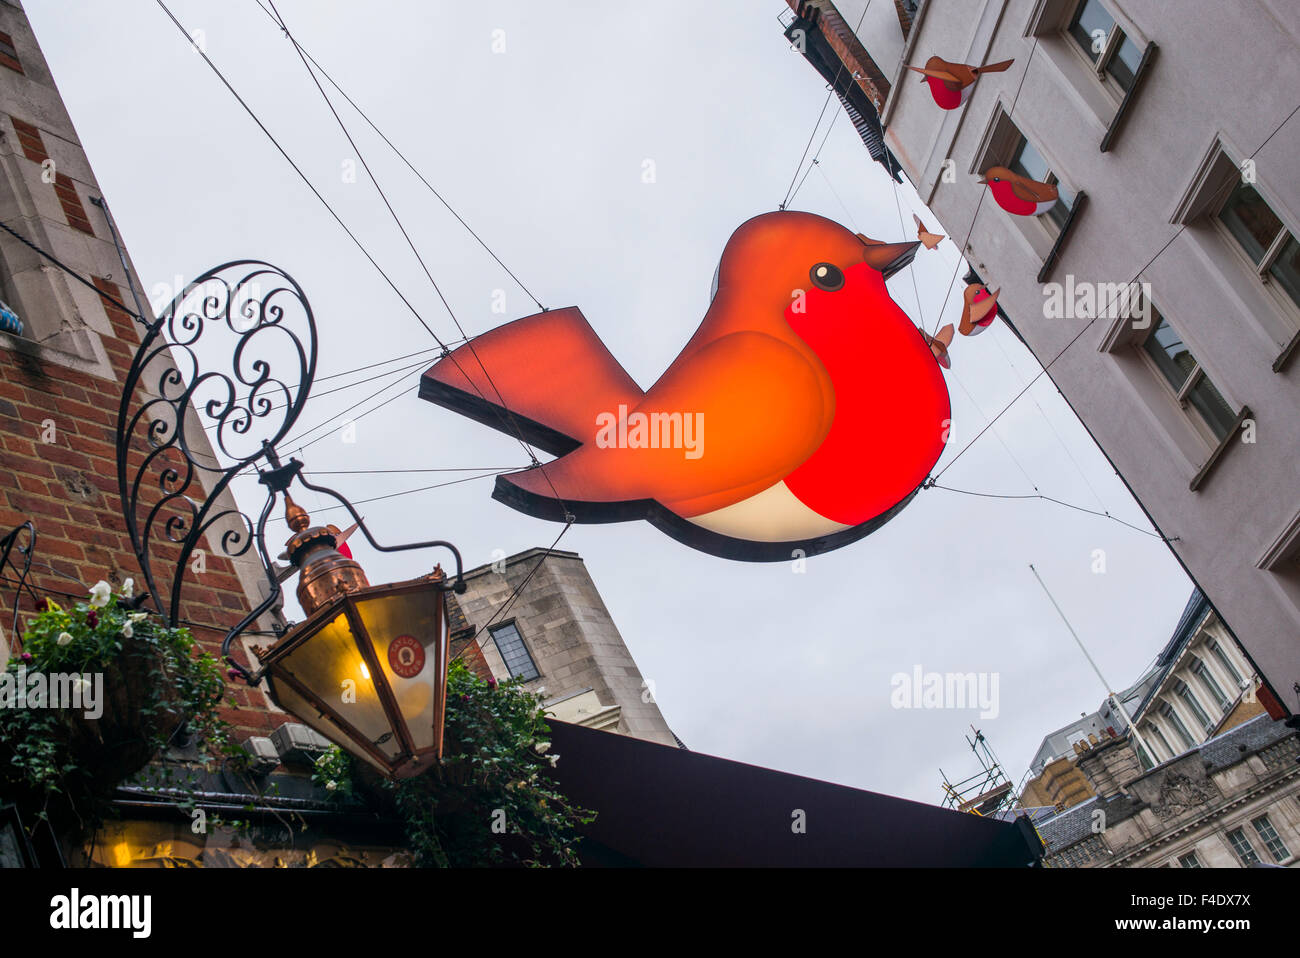 England, London, Soho, Carnaby Street, Christmas signs - Stock Image